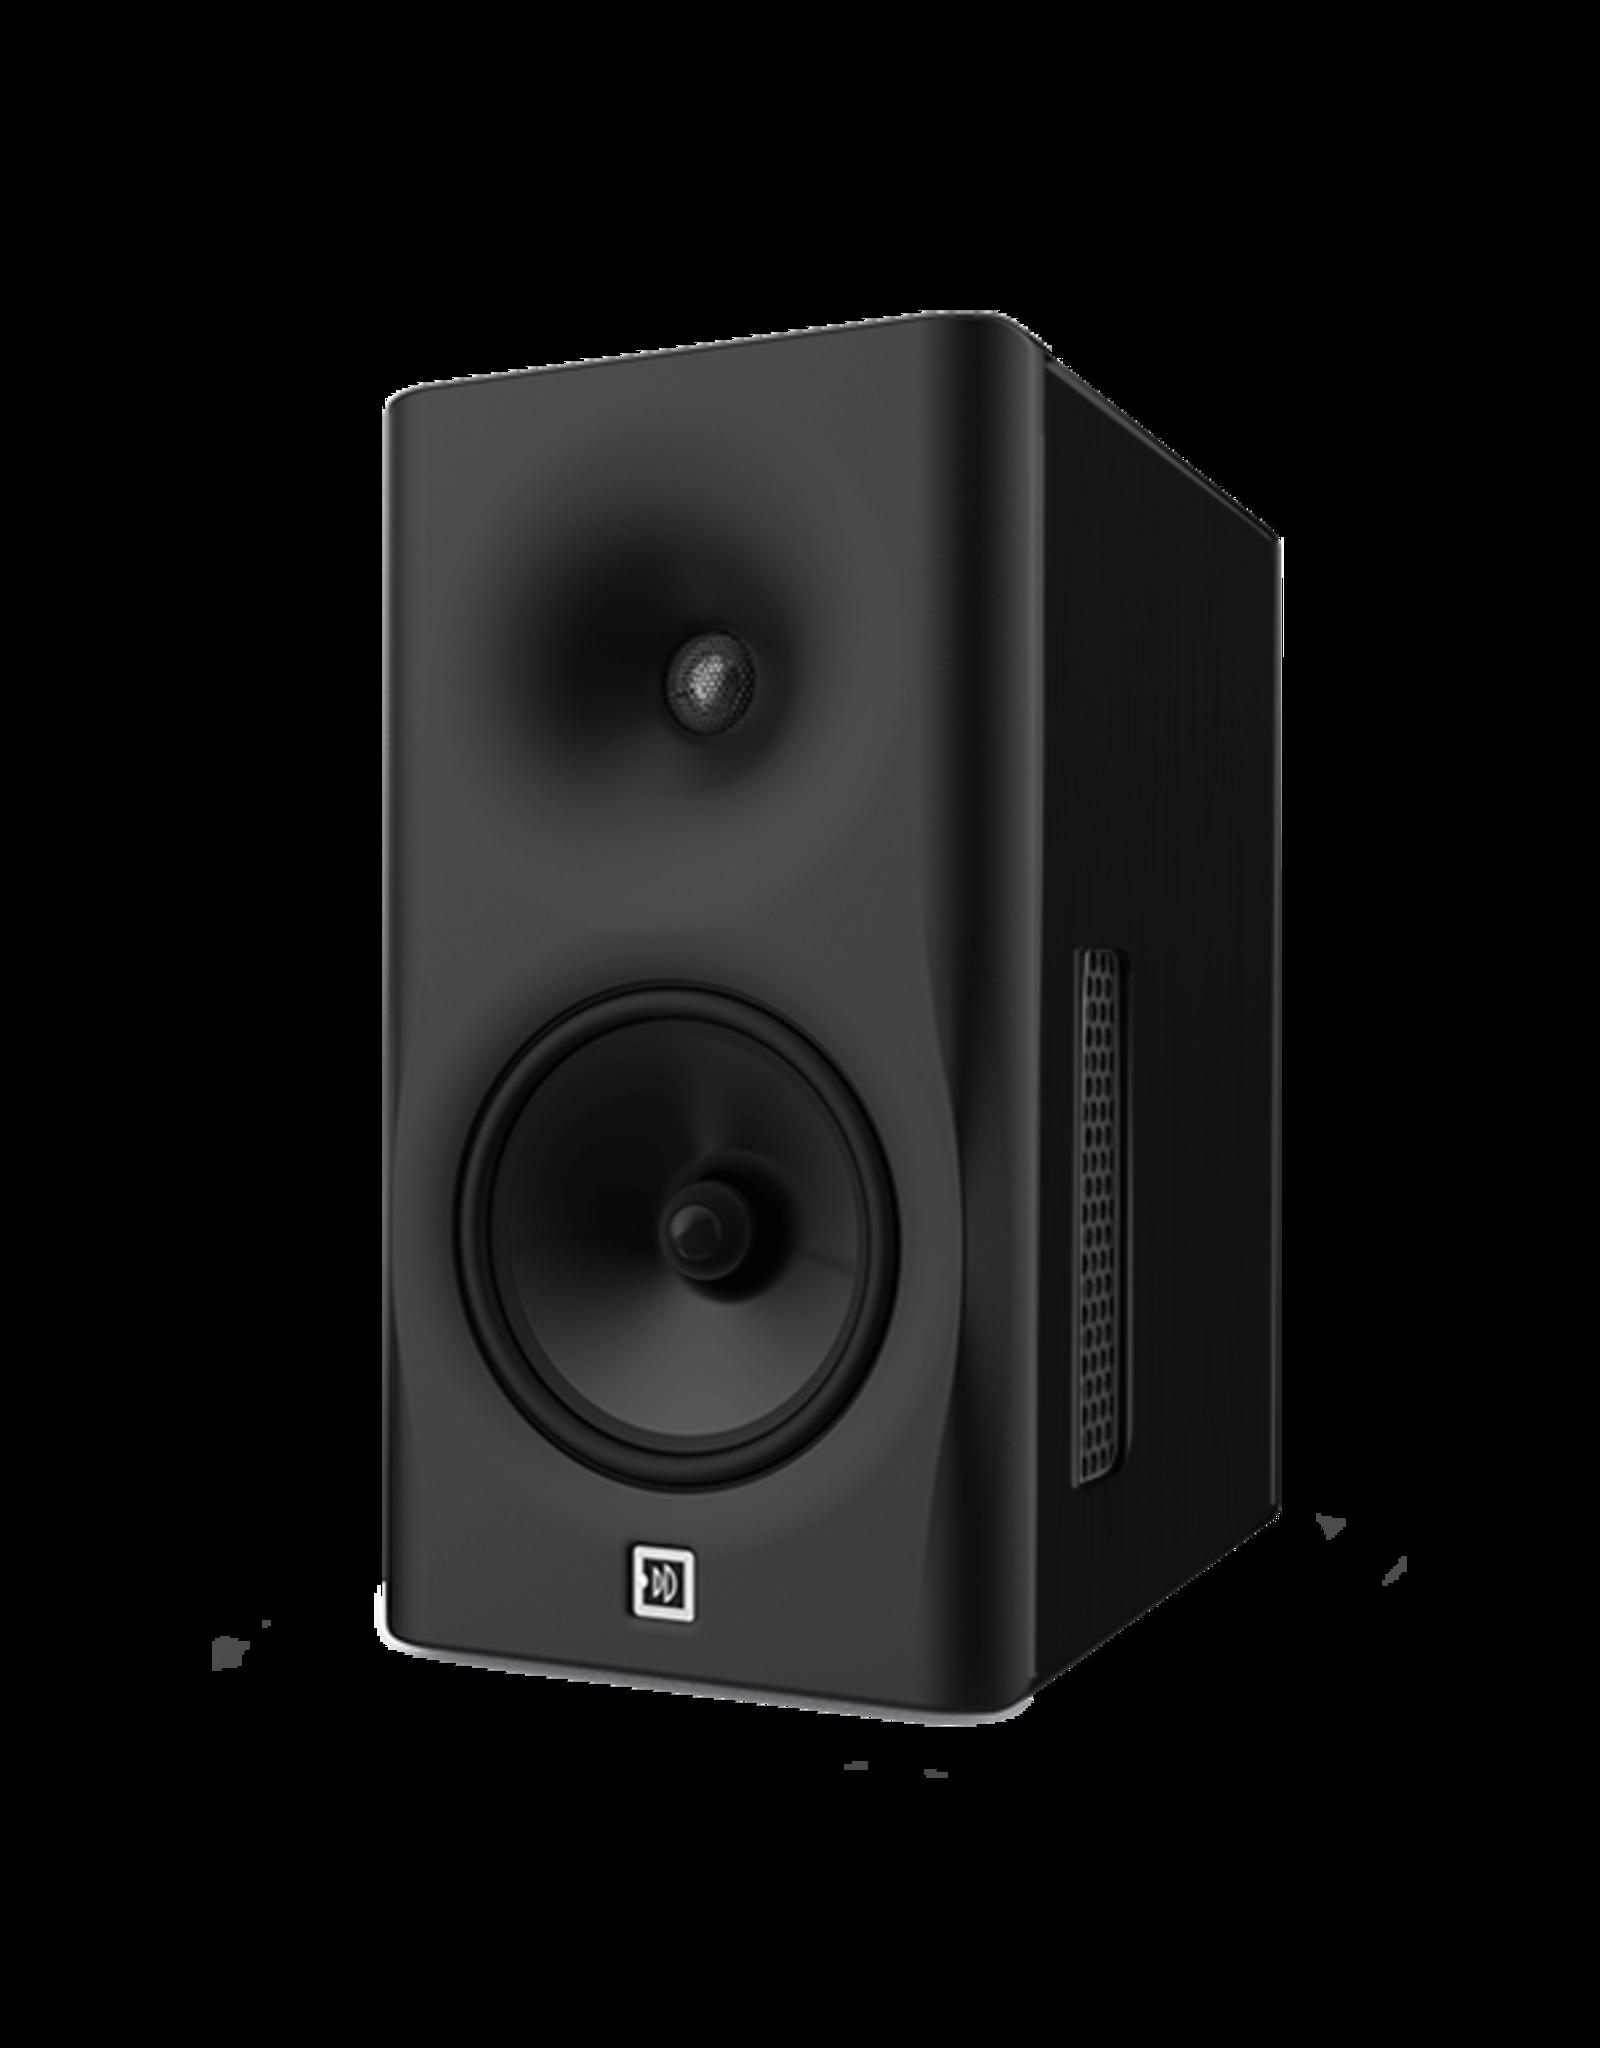 Dutch & Dutch 8C studio speaker, black baffle, black cabinet